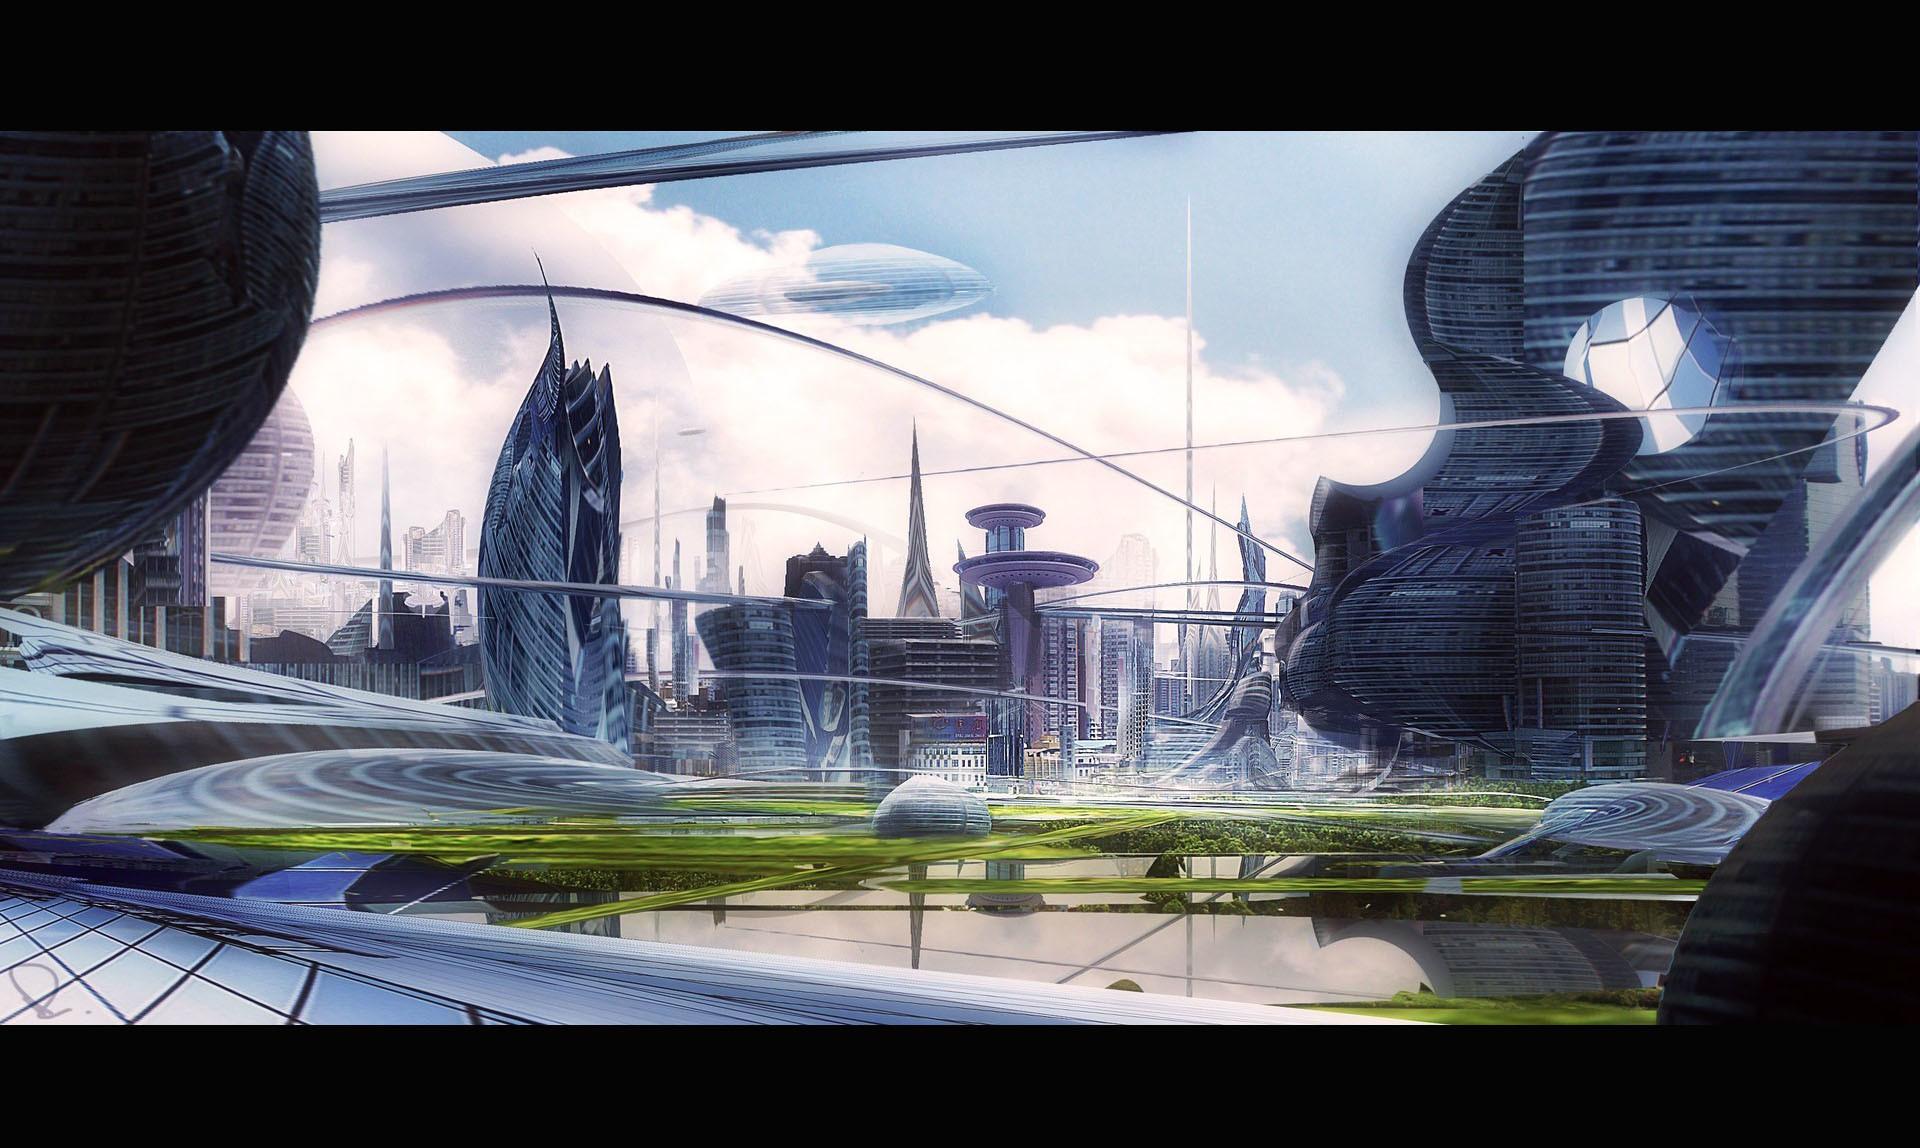 Marcin rubinkowski marcin rubinkowski glass city 4 1